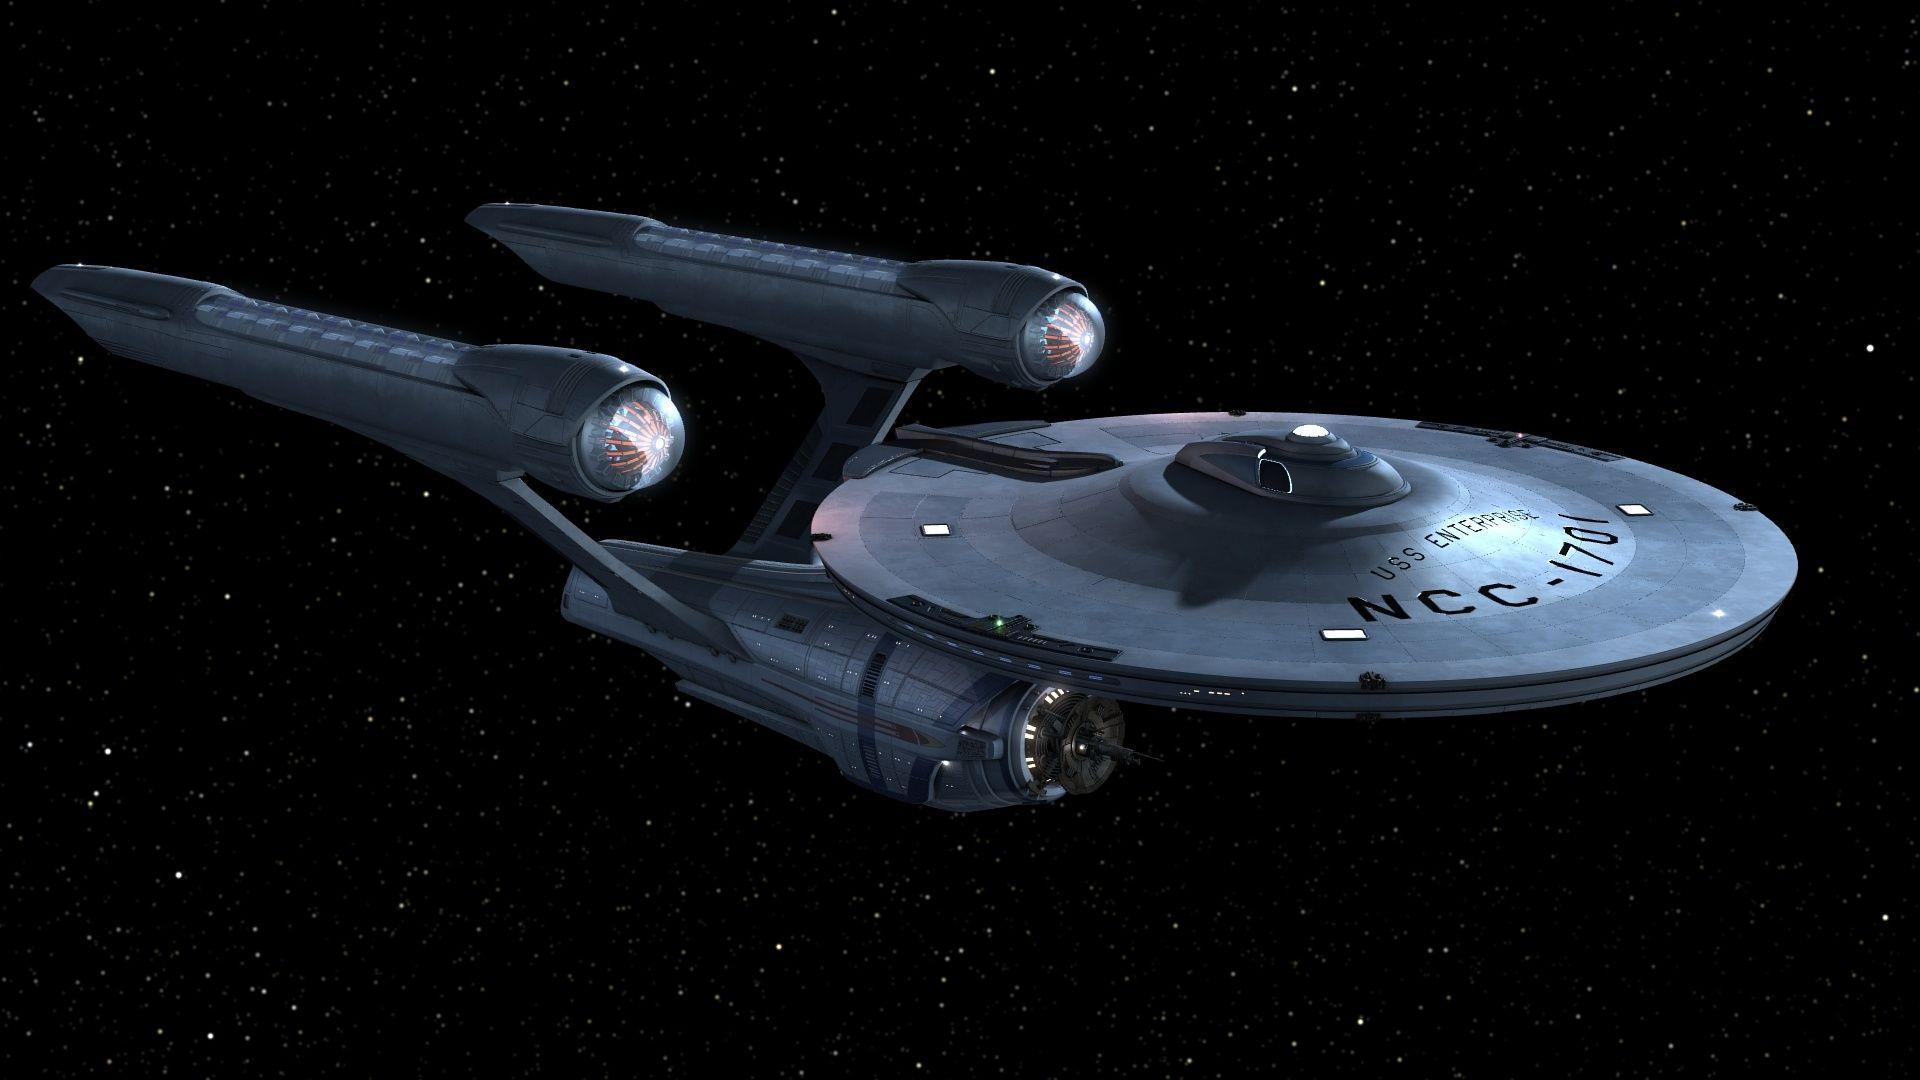 star-trek-1920x1080-575716-uss-enterprise